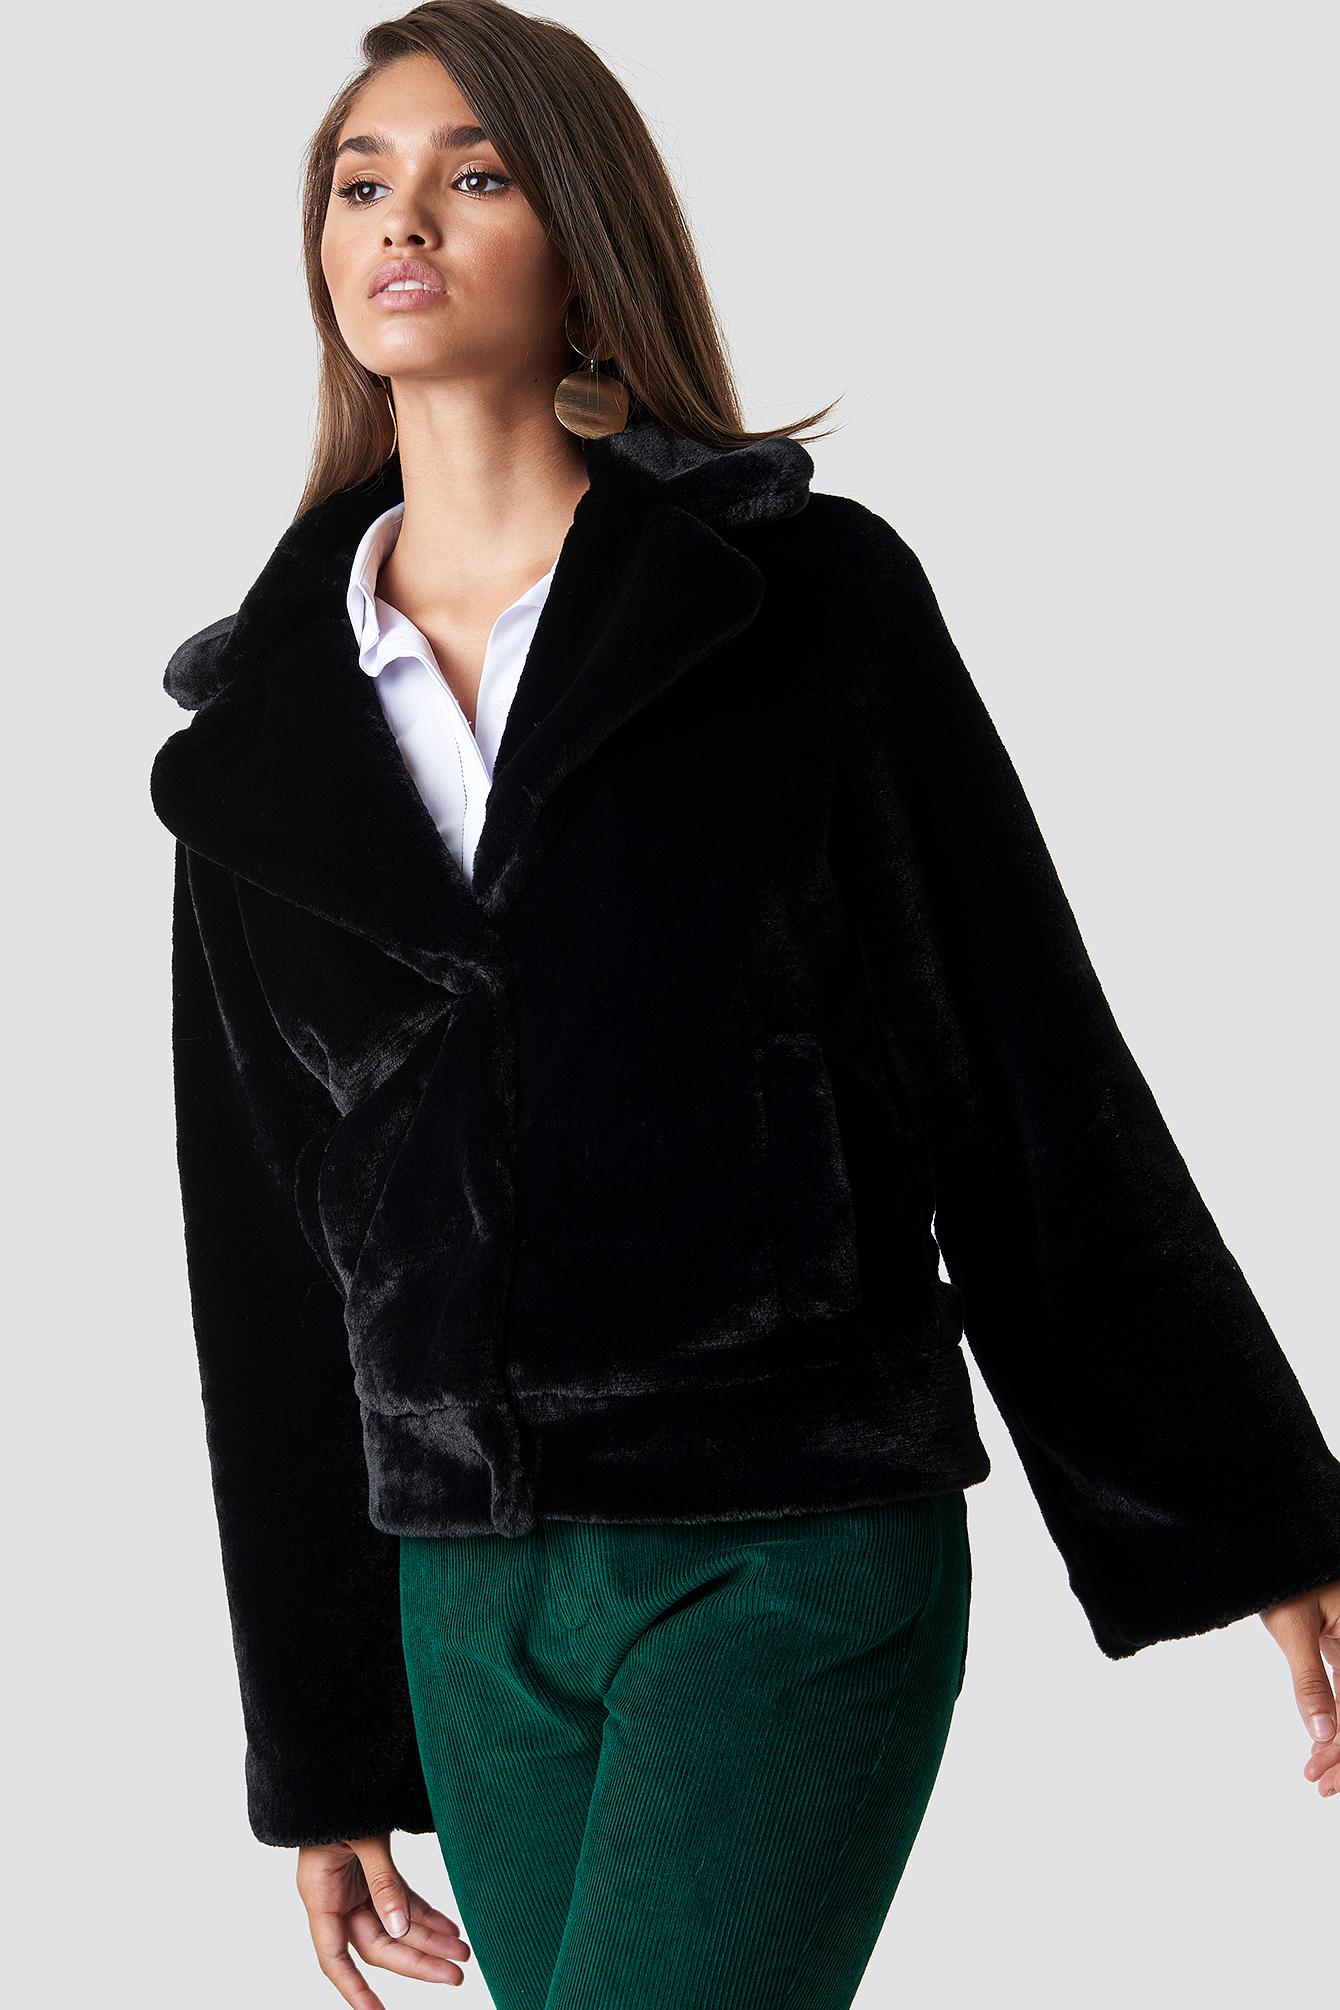 hannalicious x na-kd -  Wide Sleeve Faux Fur Jacket - Black